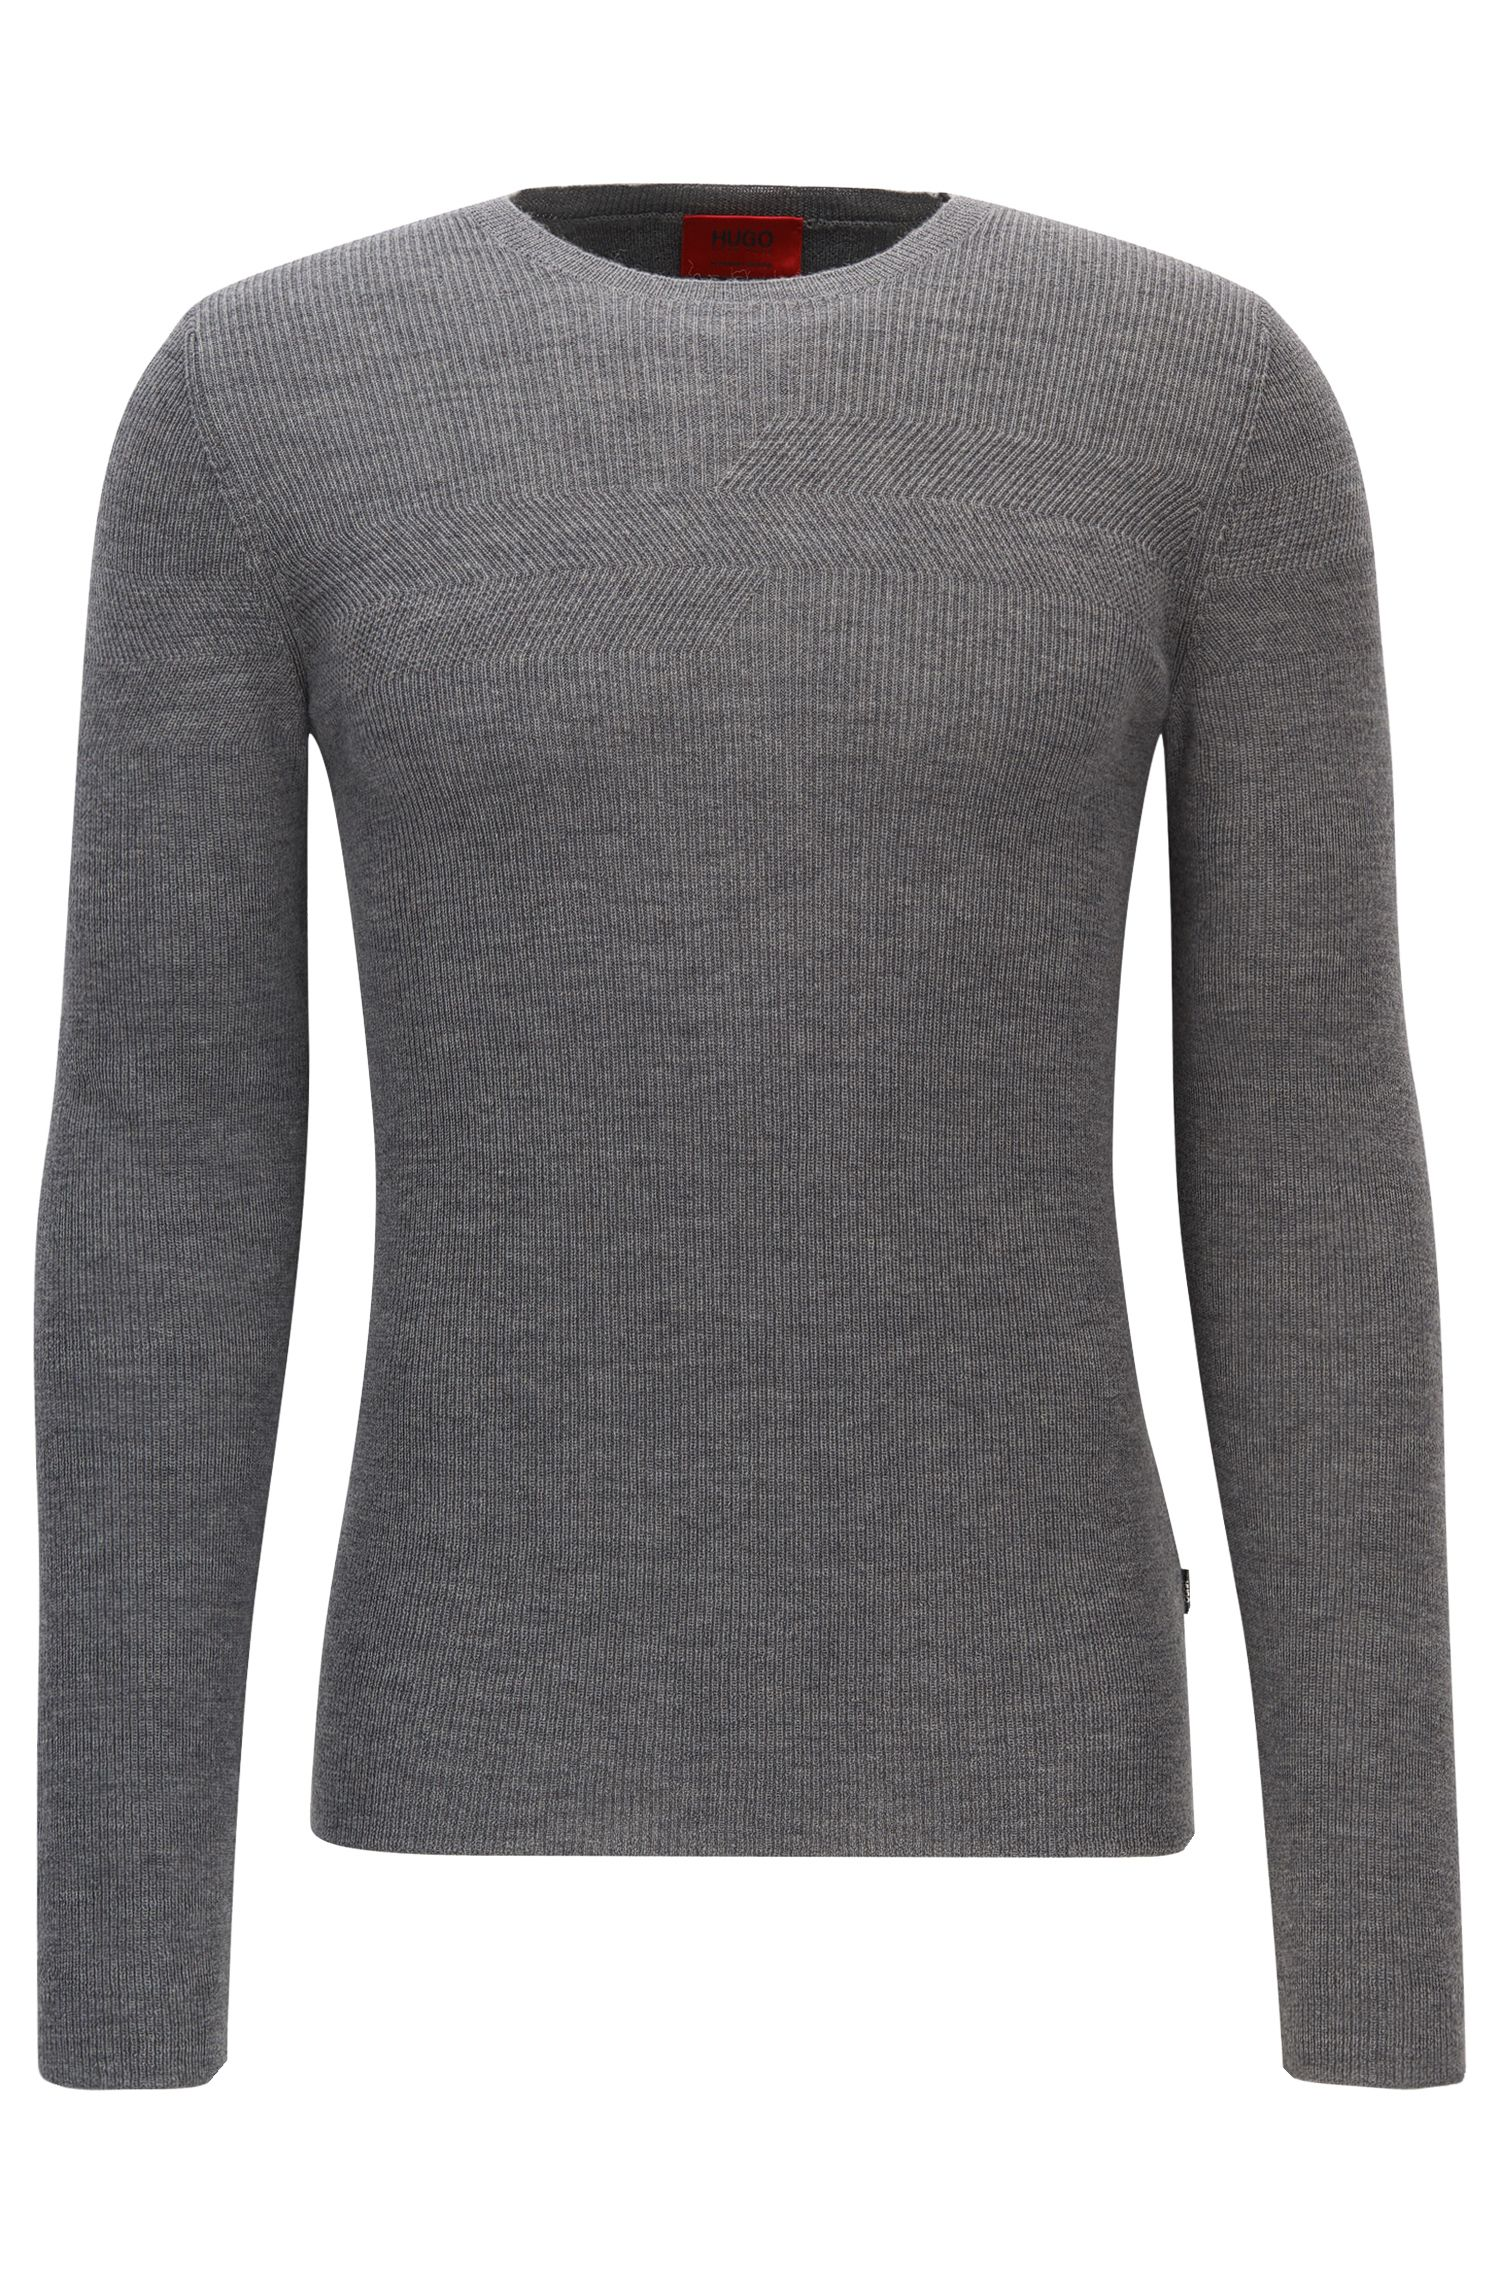 Ribbed Virgin Wool Sweater | Sarow, Open Grey